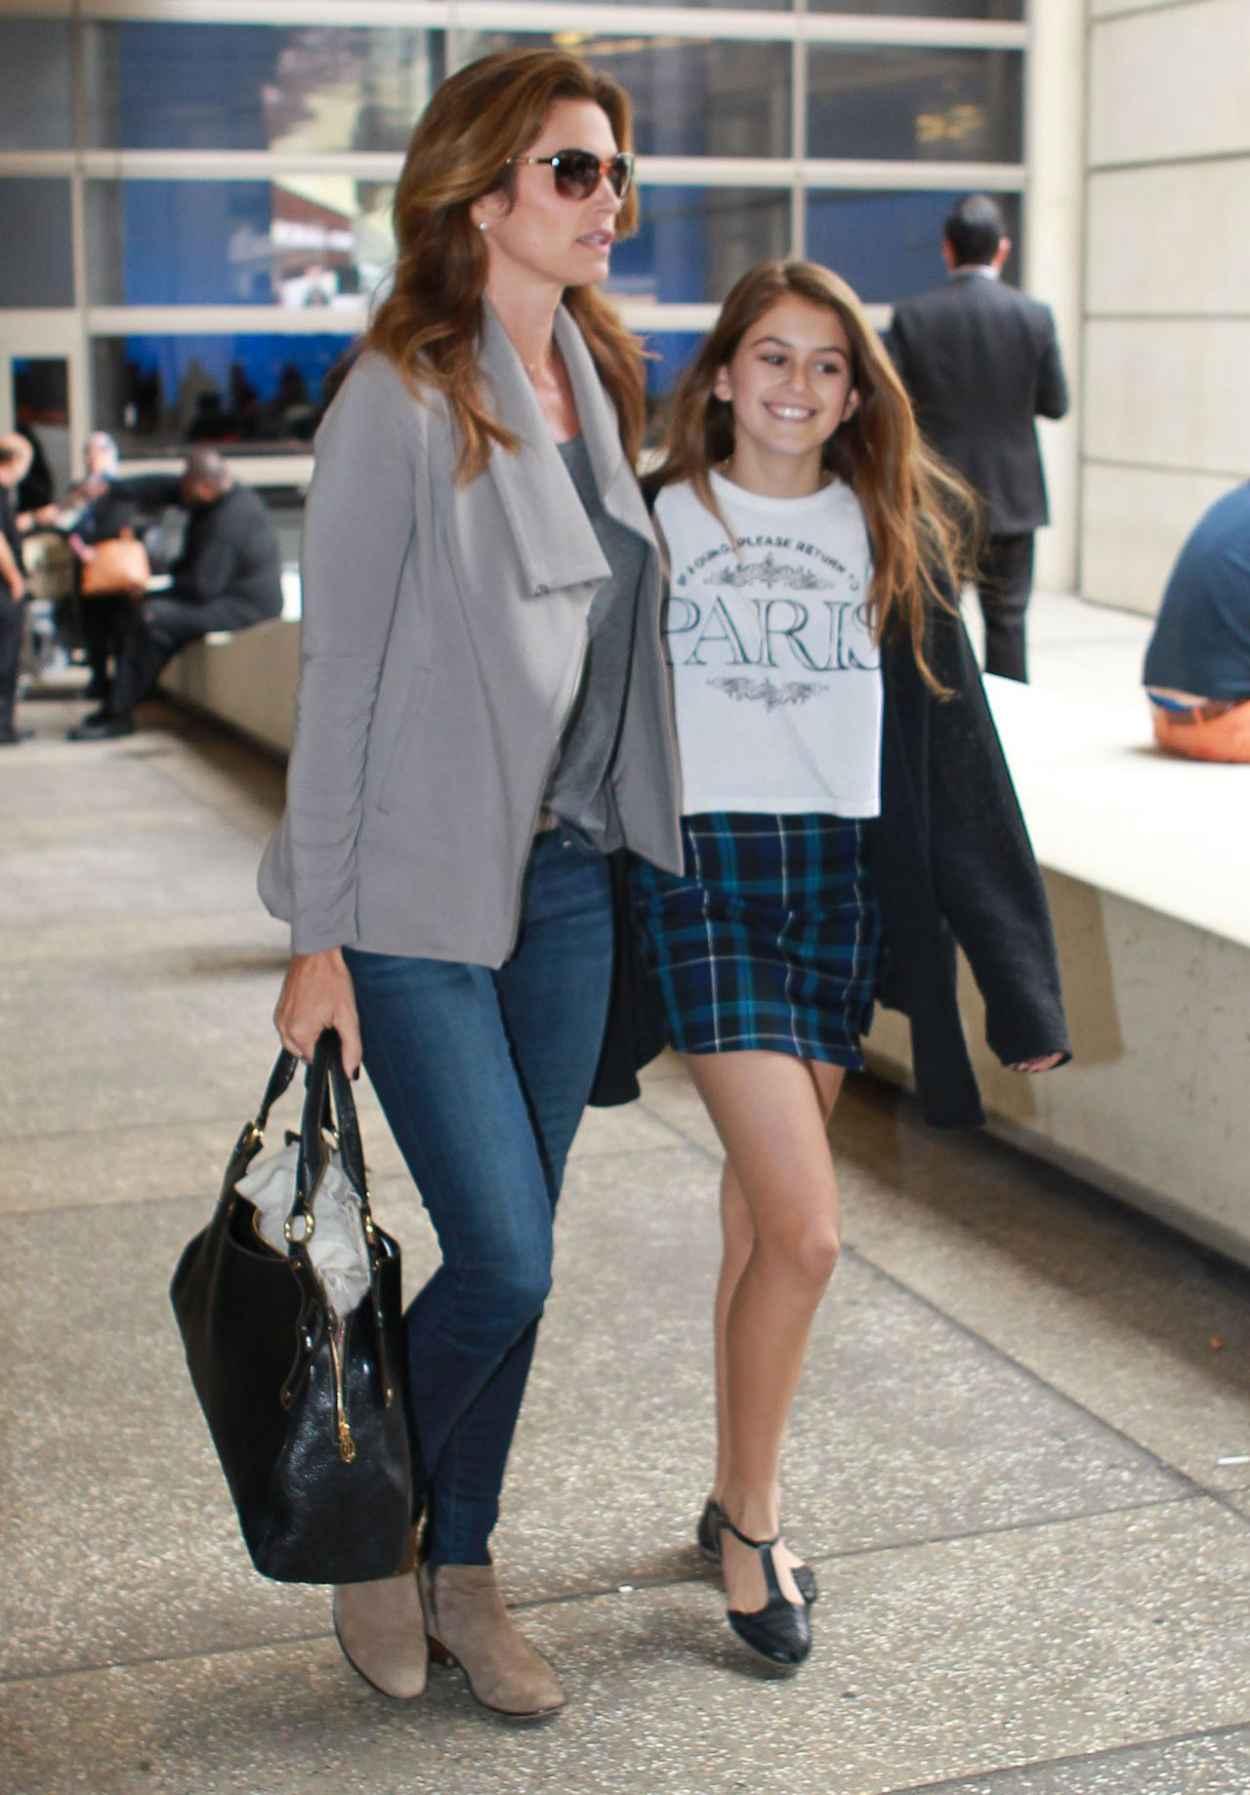 Cindy Crawford and Kaia Jordan Gerber at LAX Airport - May 2015-4